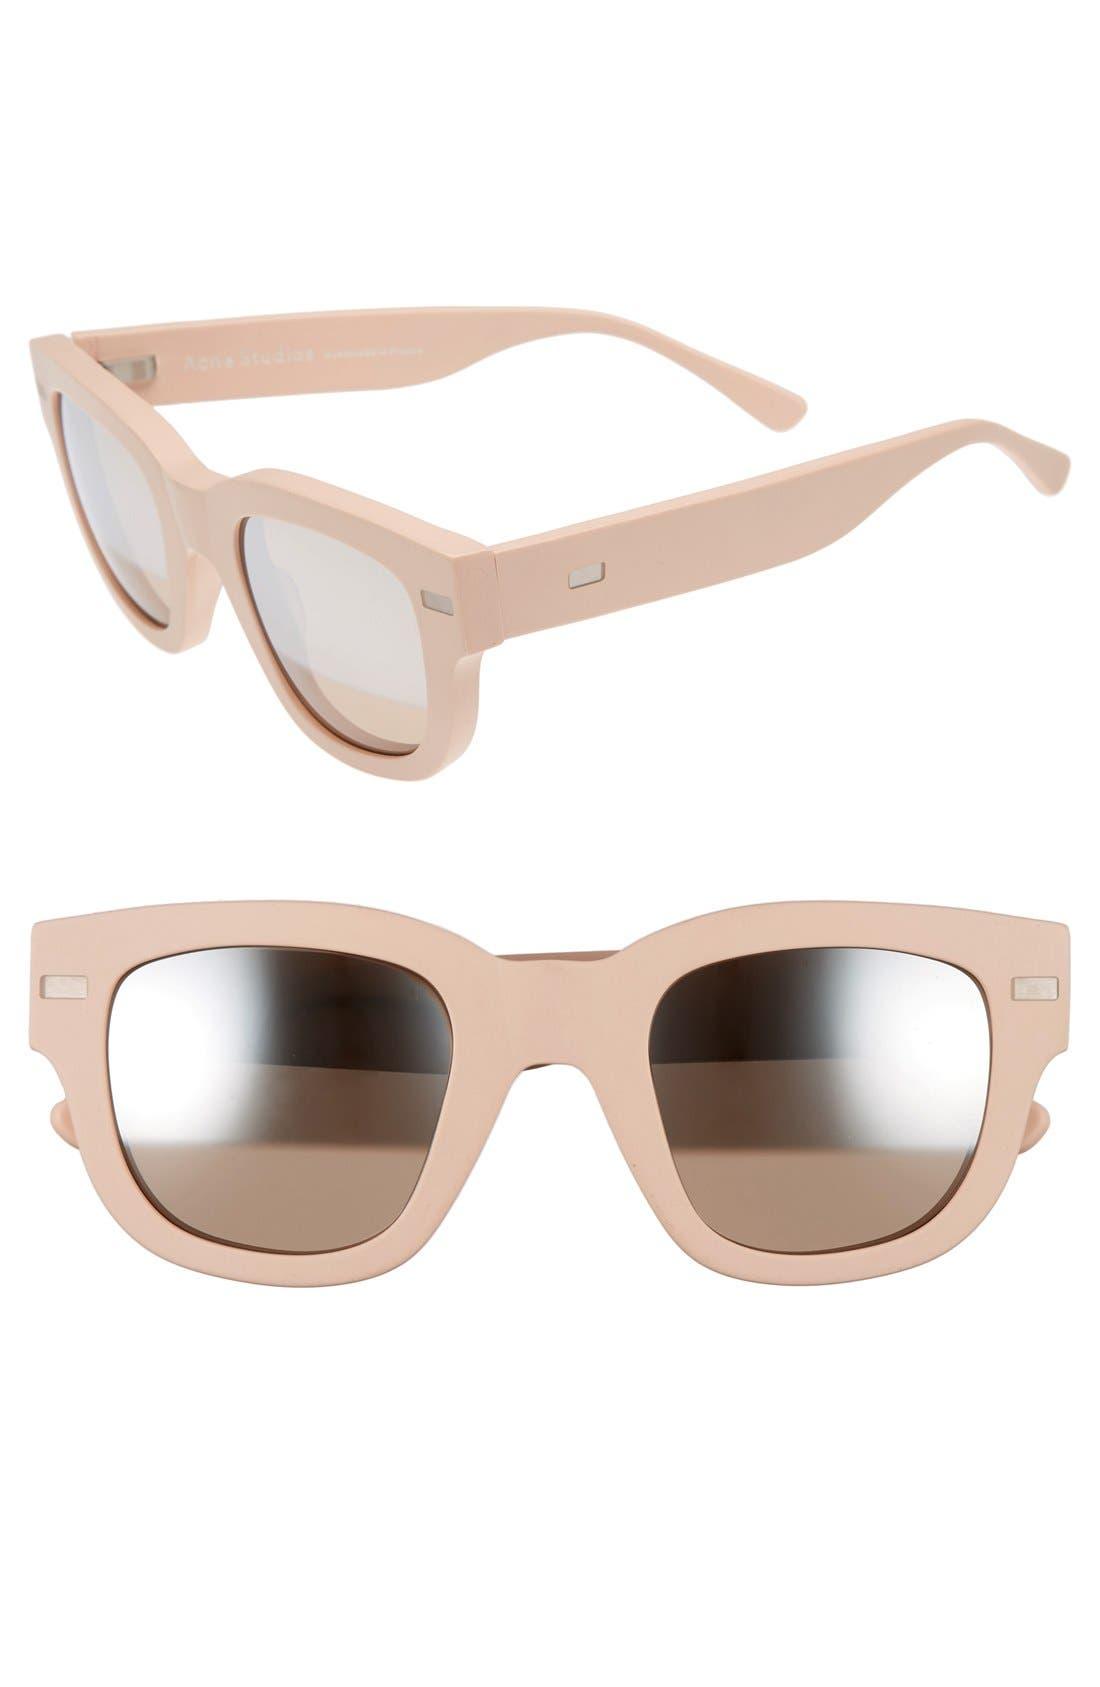 47mm Sunglasses,                             Main thumbnail 2, color,